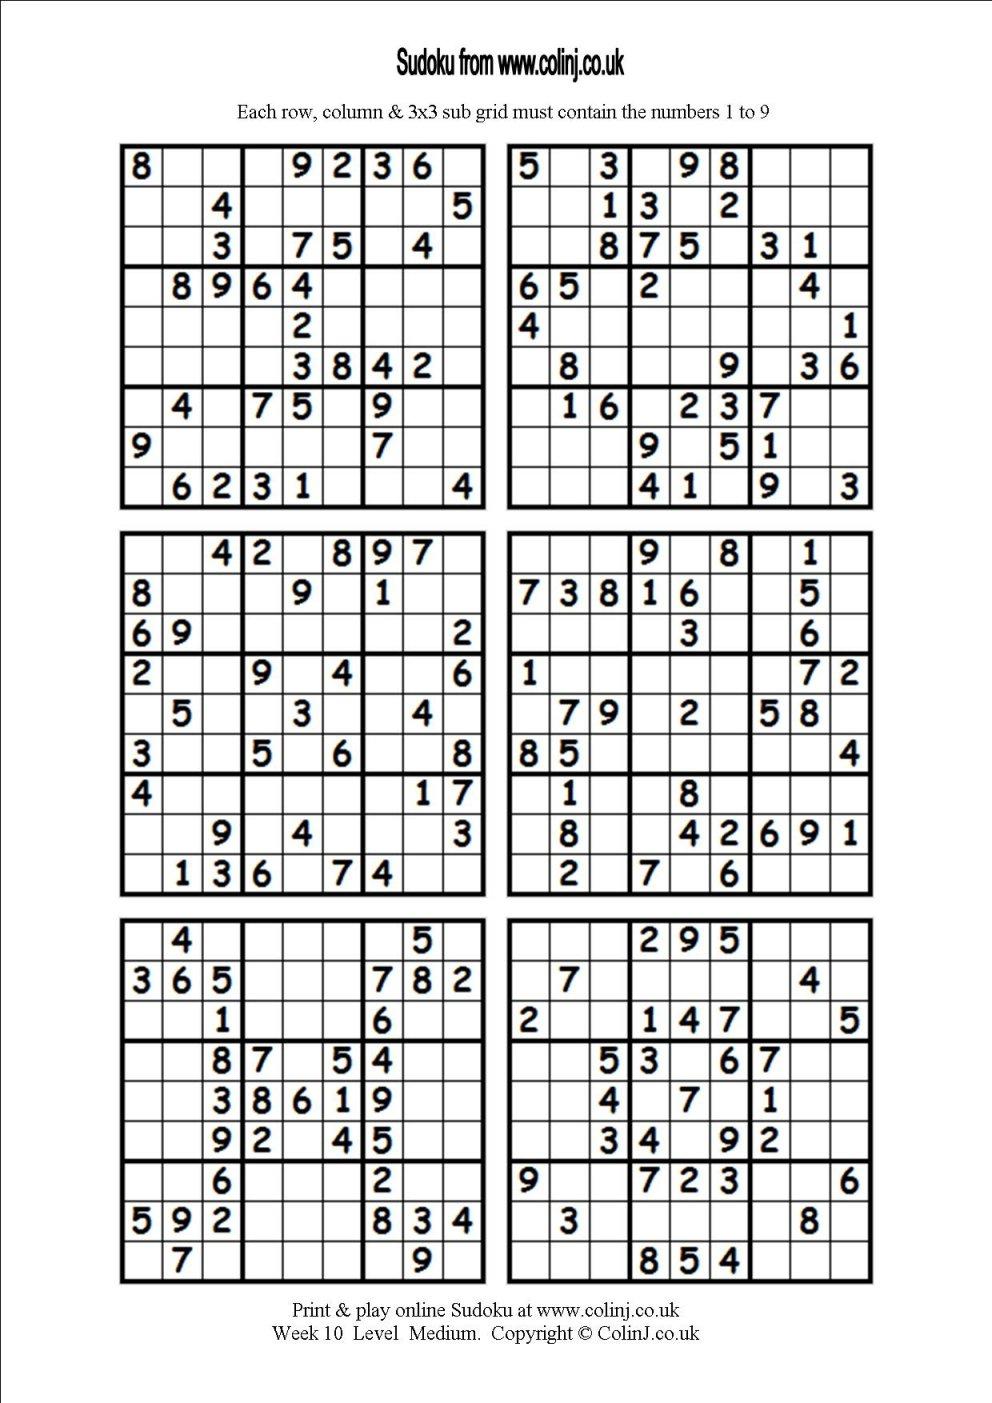 Printable Sudoku Puzzles 6 Per Page   Download Them Or Print - Free - Printable Sudoku Puzzles 1 Per Page